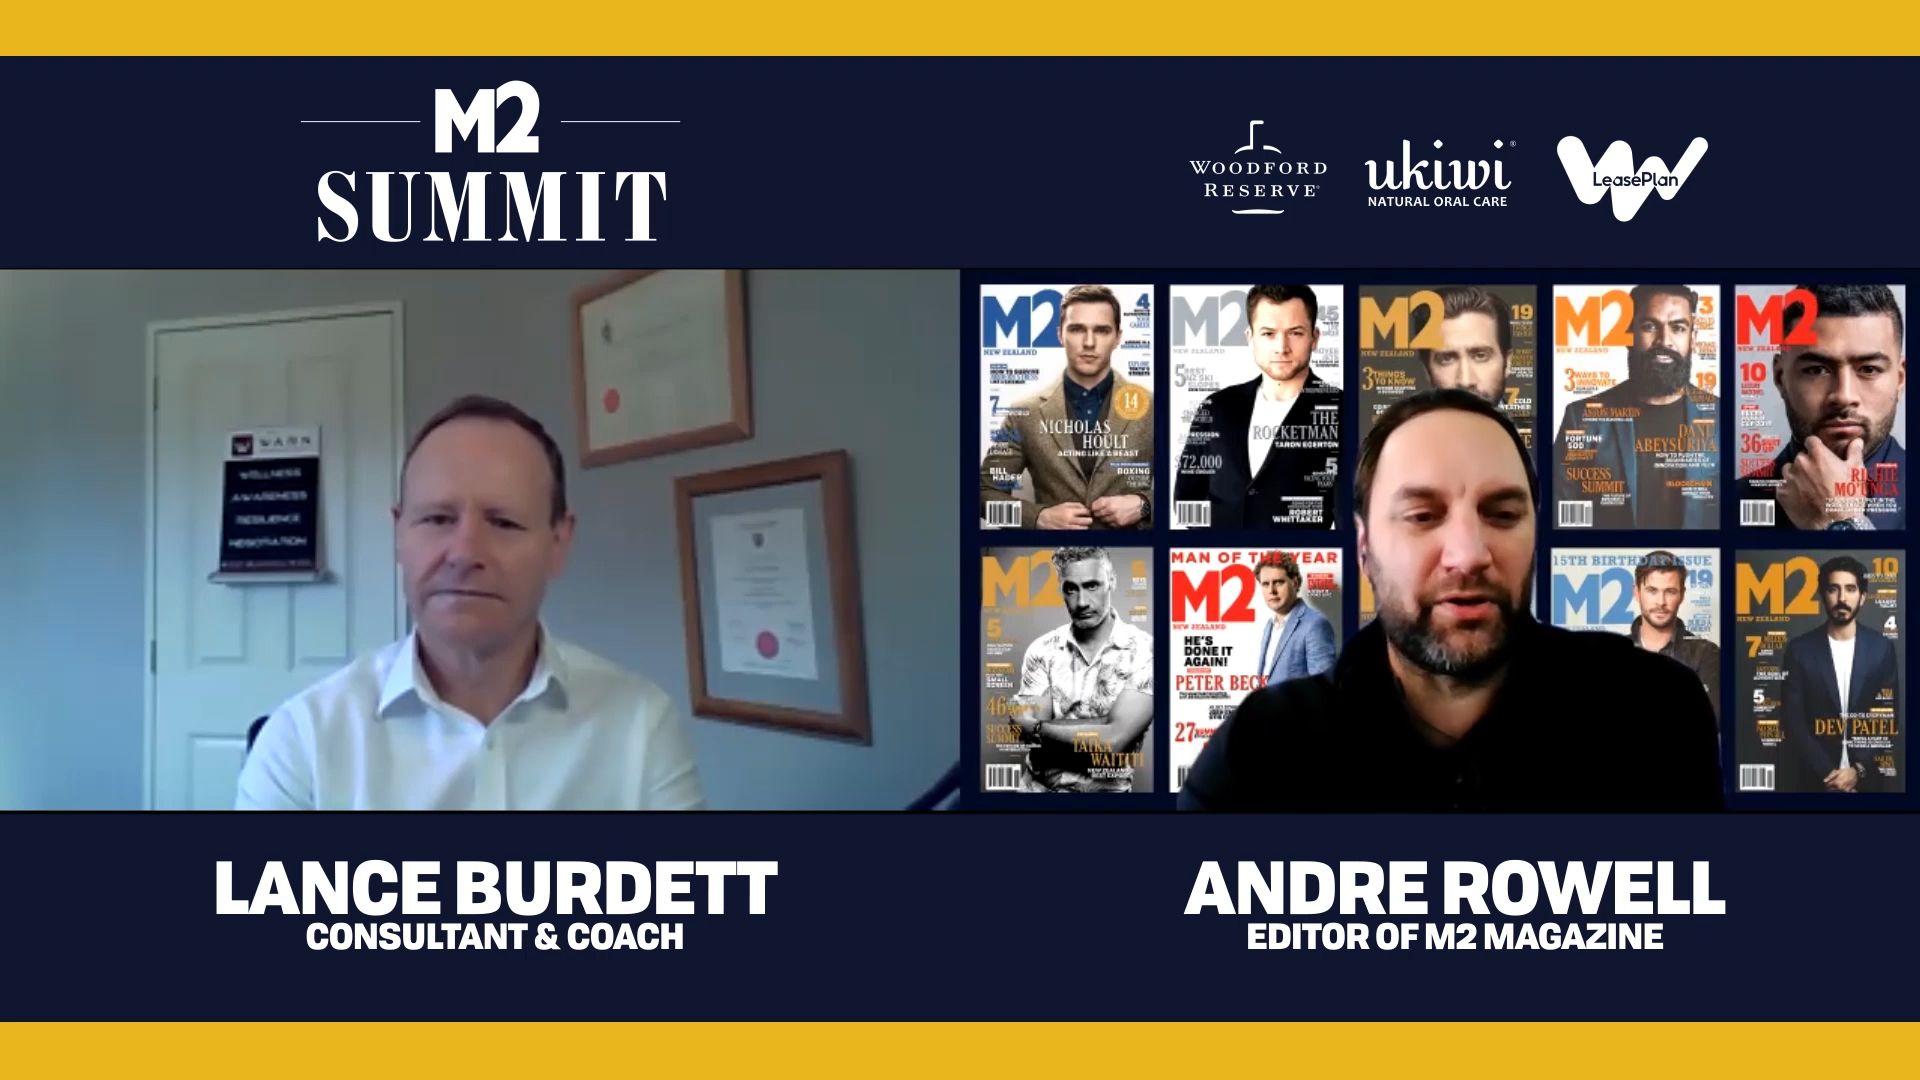 lance-burdett-Summit